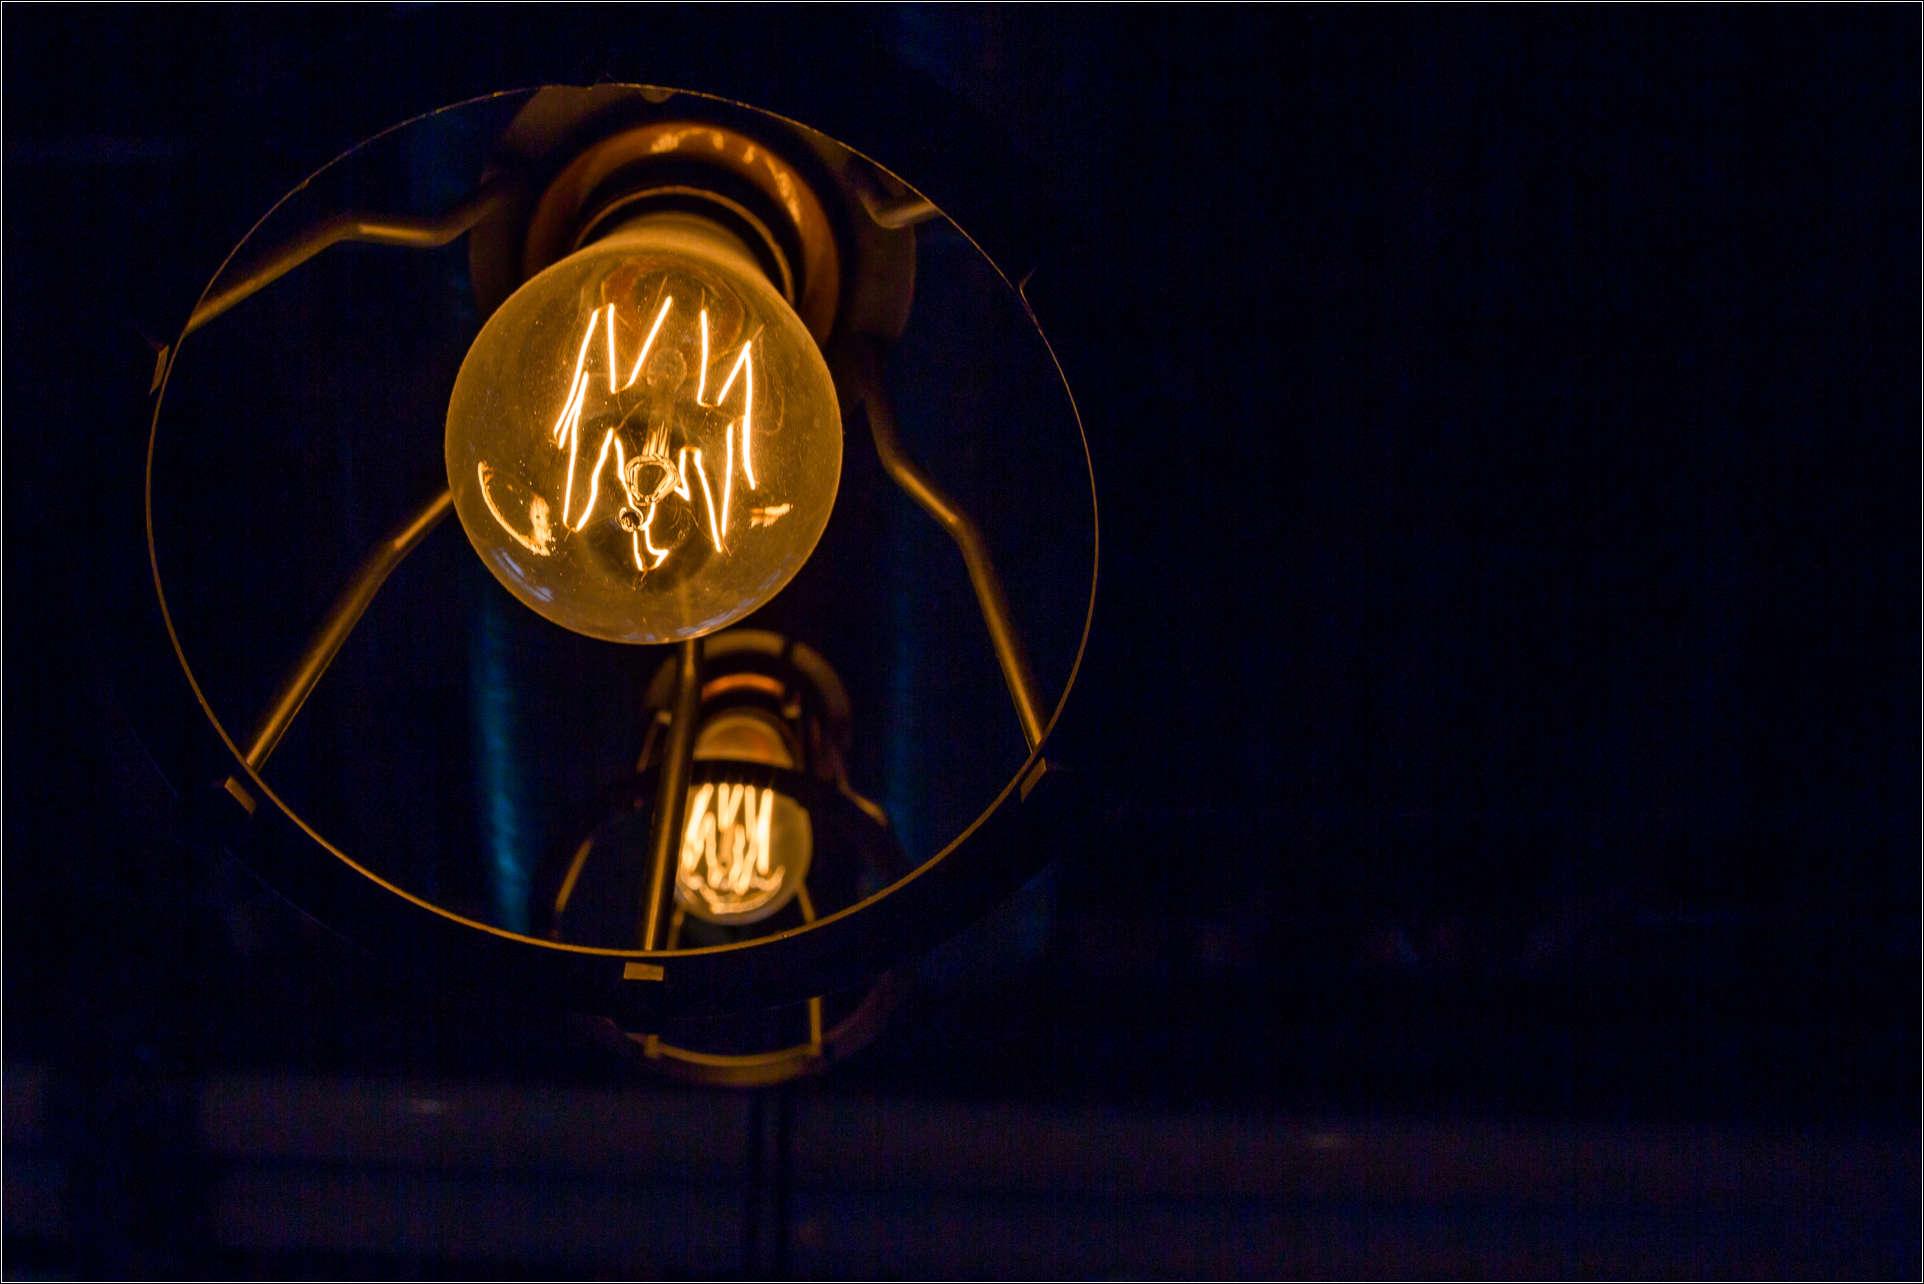 Steampunk lighting - 2013 © Christopher Martin